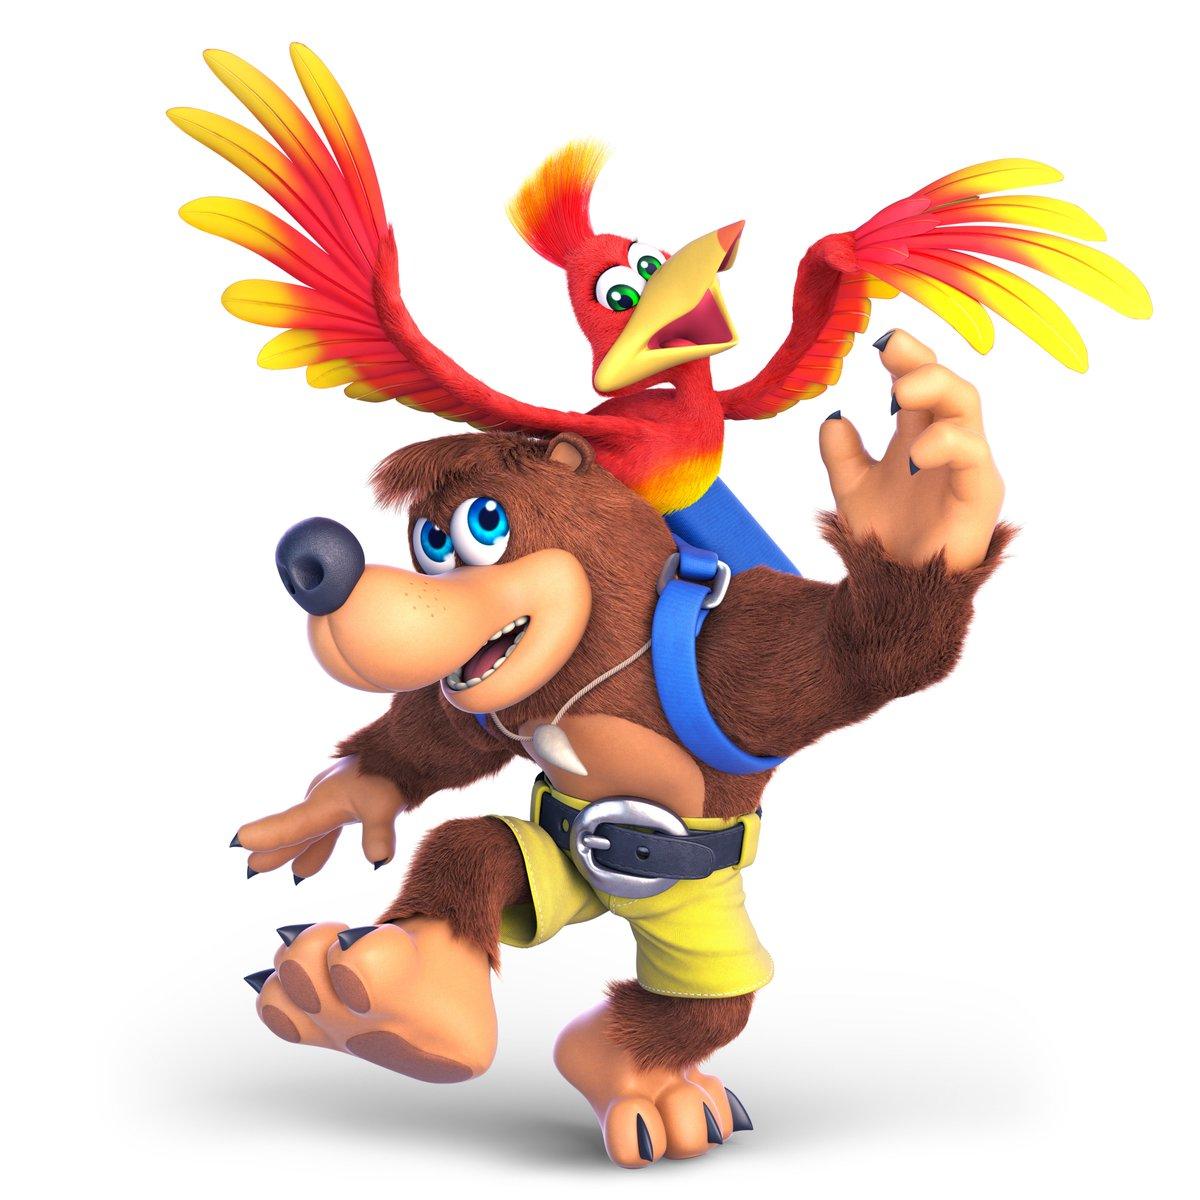 Banjo-Kazooie announced for Super Smash Bros. Ultimate ...